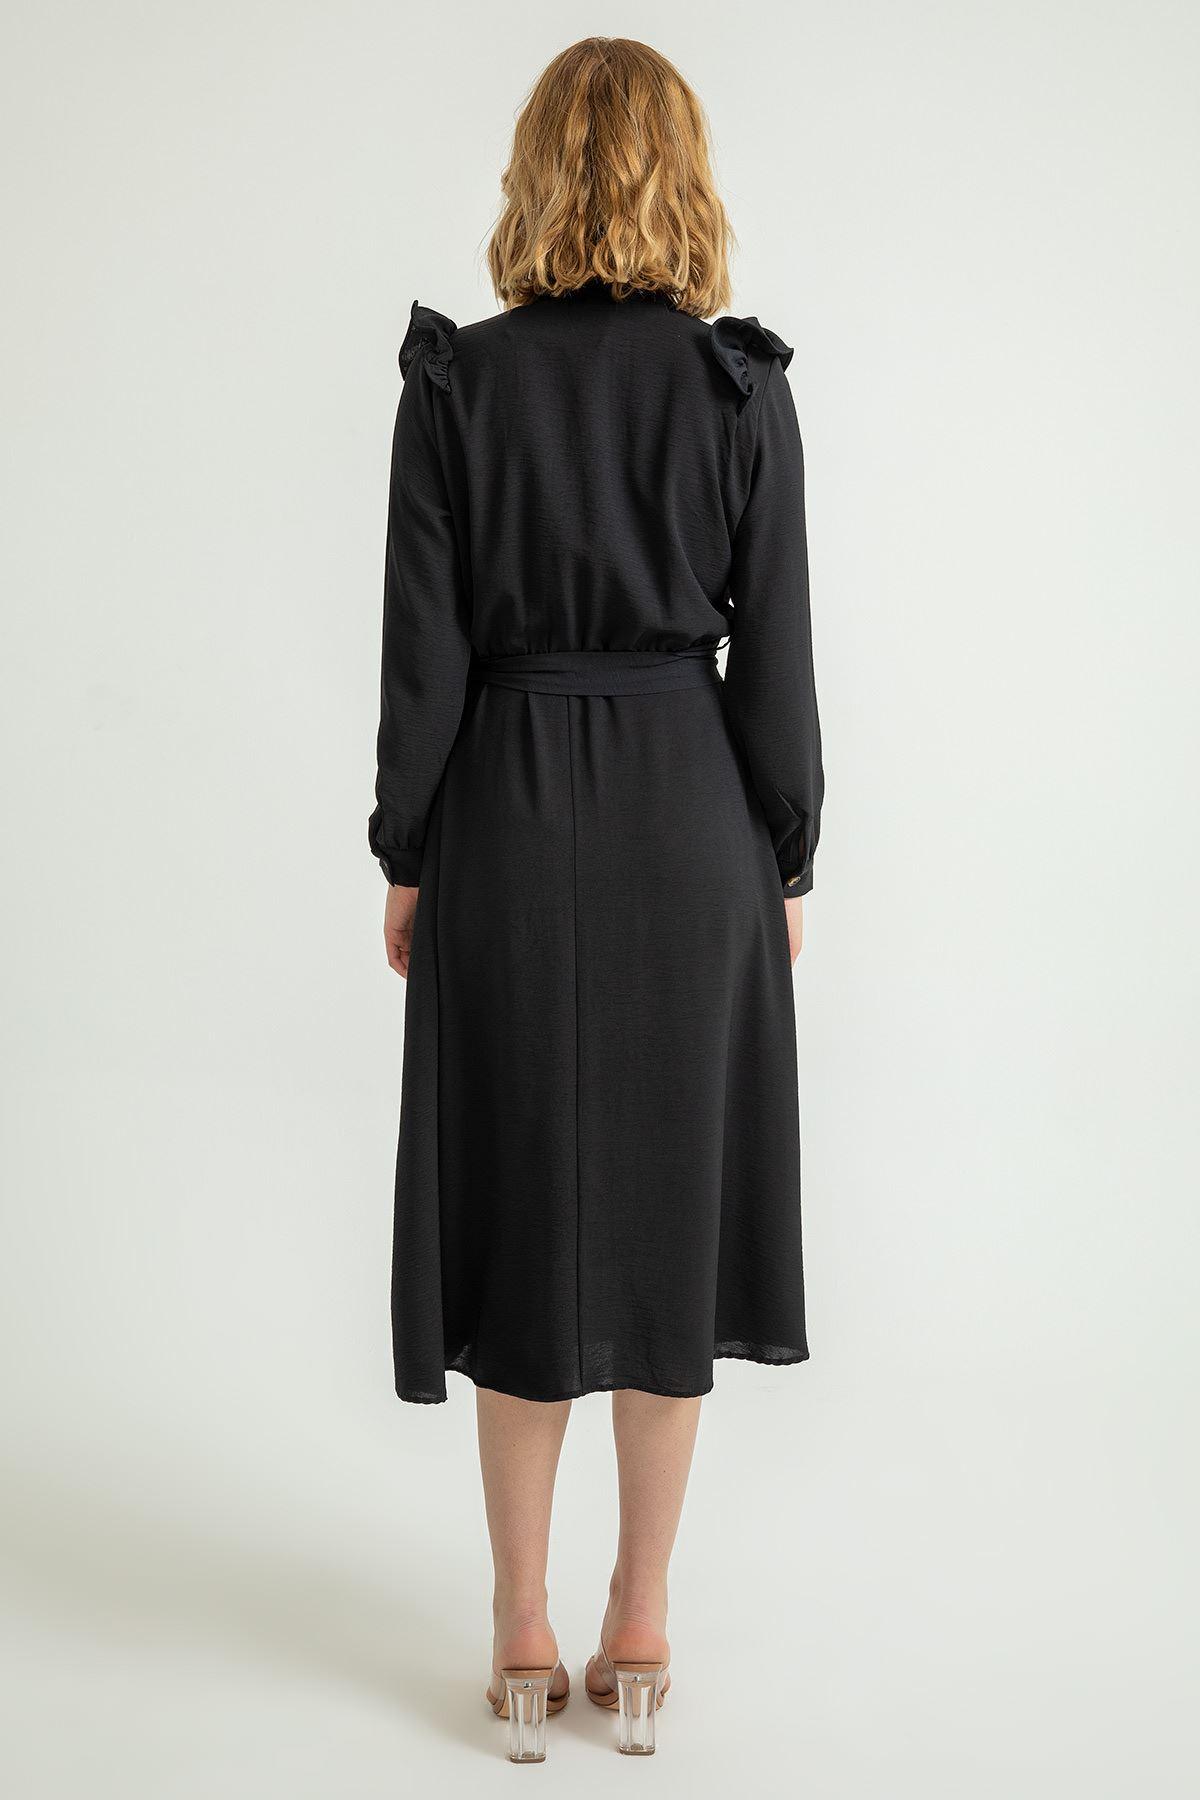 Hakim Yaka Volanlı Midi Elbise-Siyah